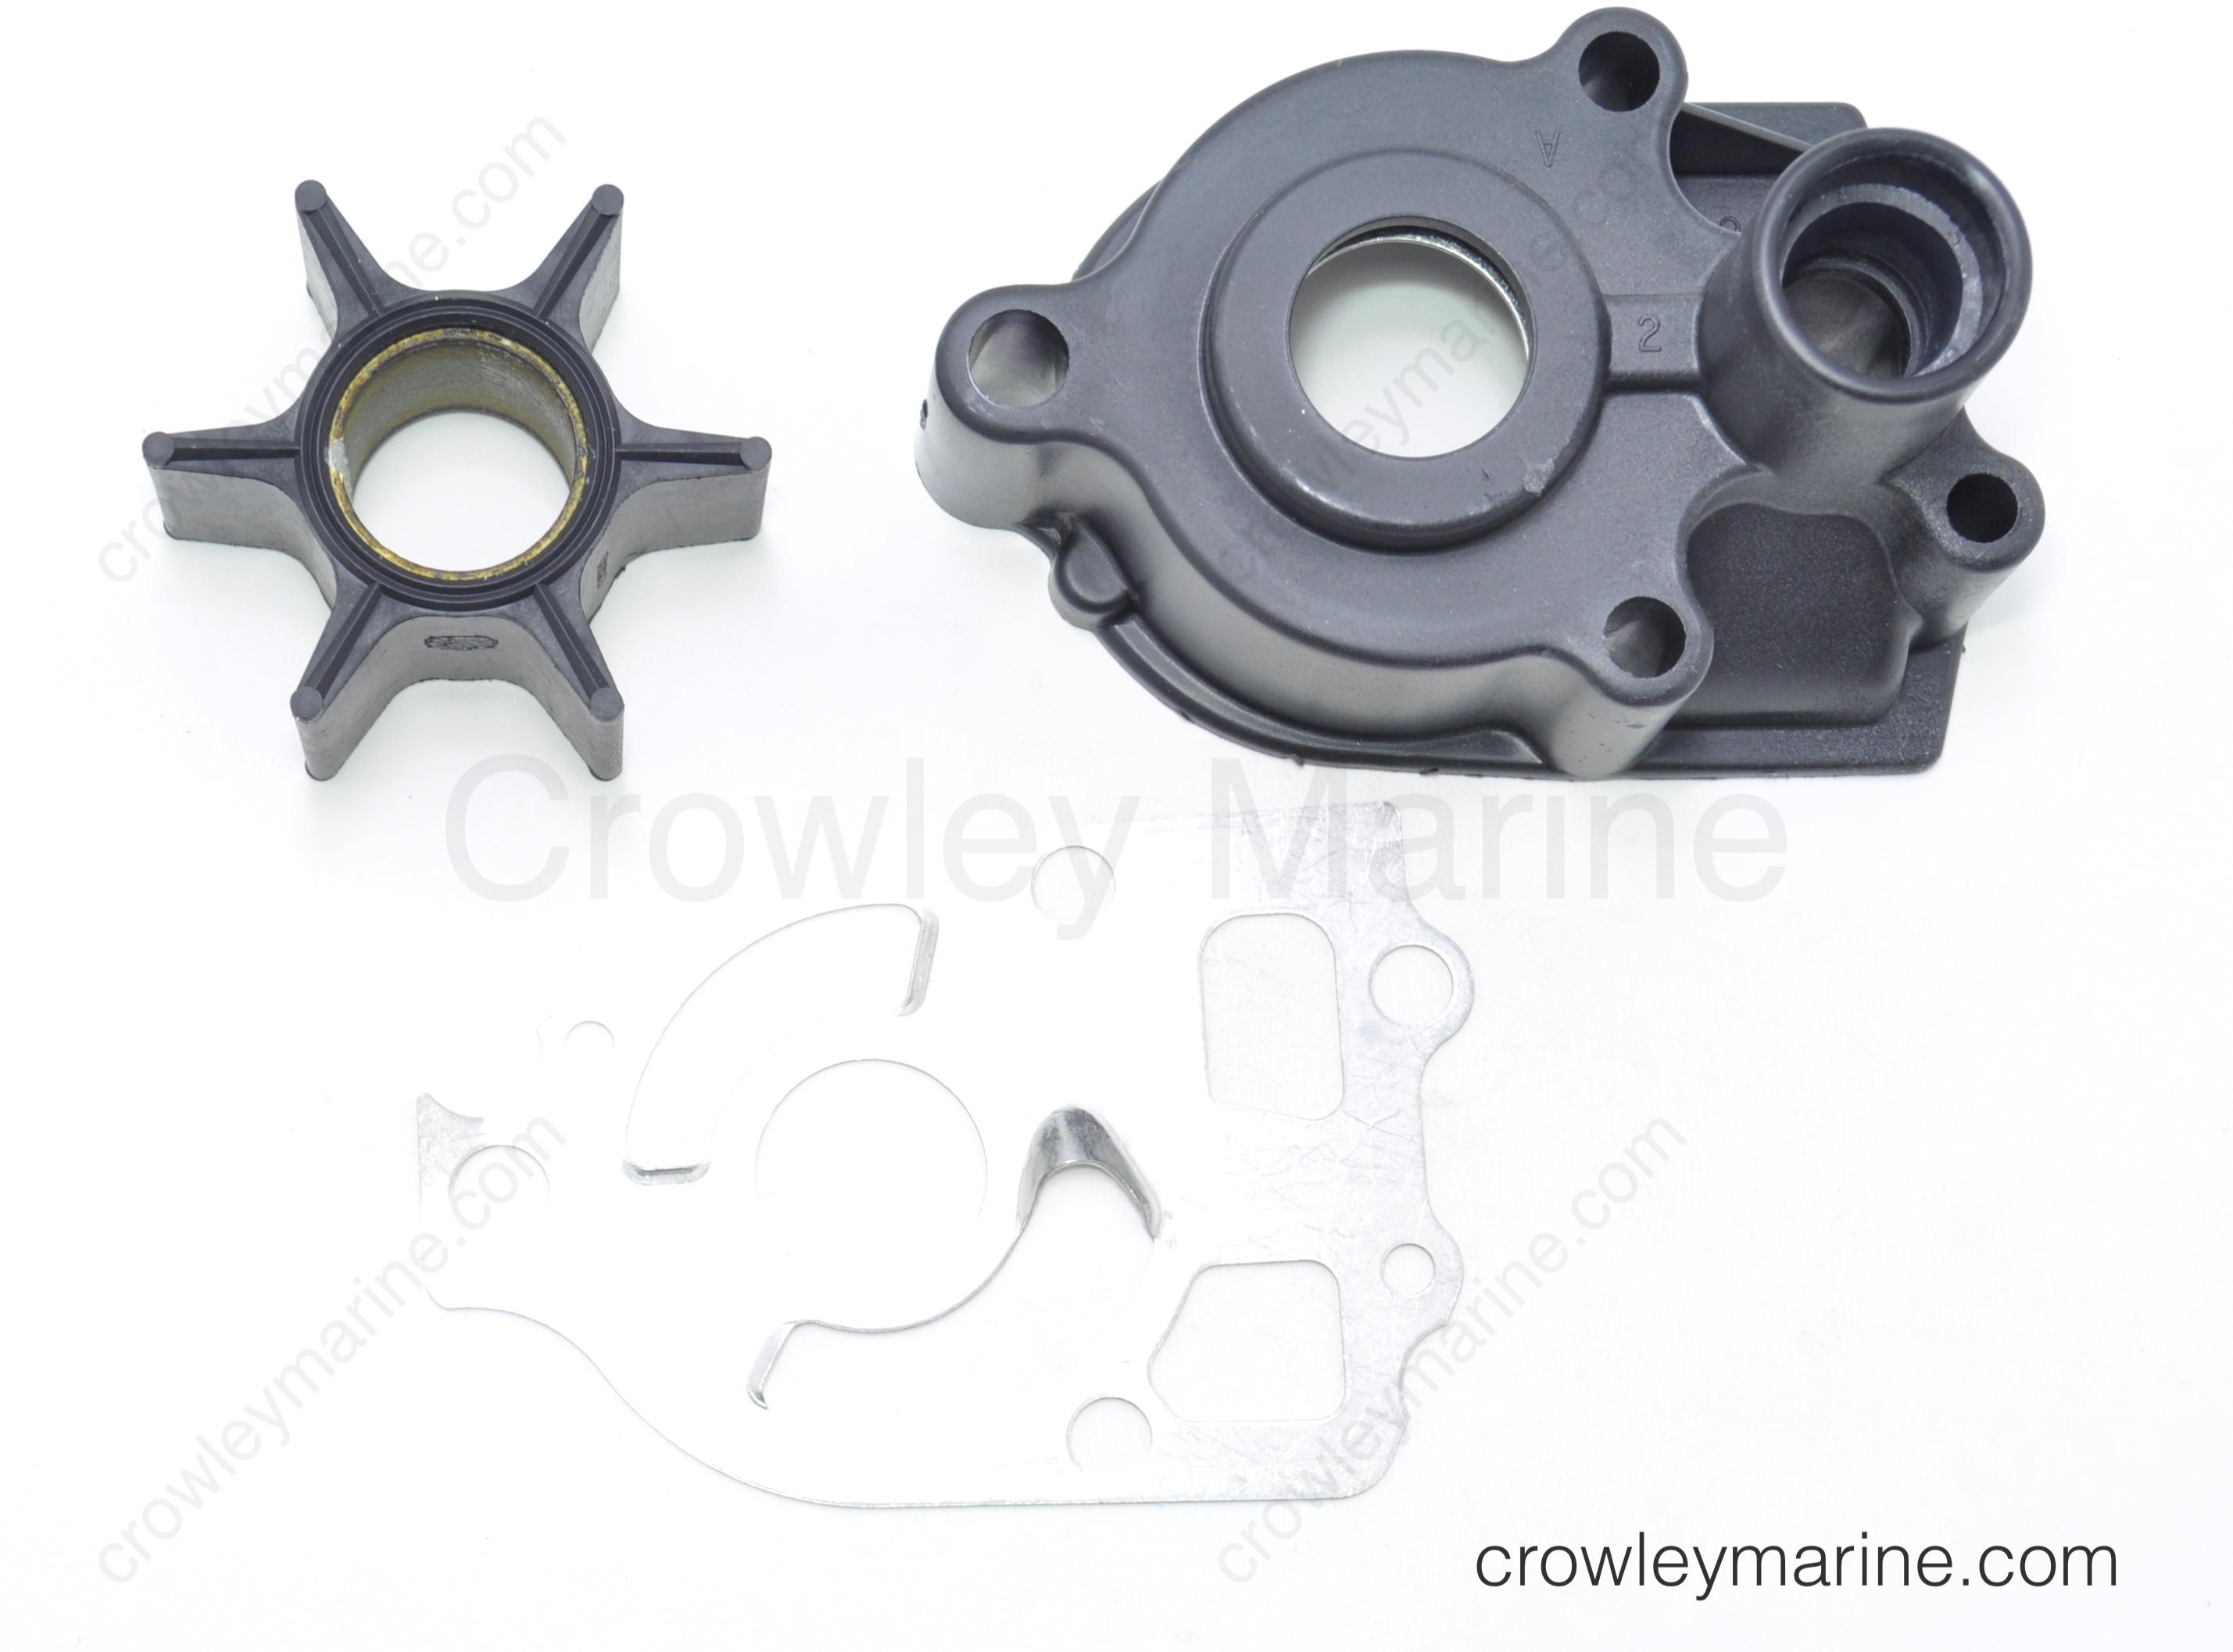 GENUINE MERCURY MARINER OUTBOARD 200hp V6 EFI WATER PUMP REPAIR KIT 46-96148A8